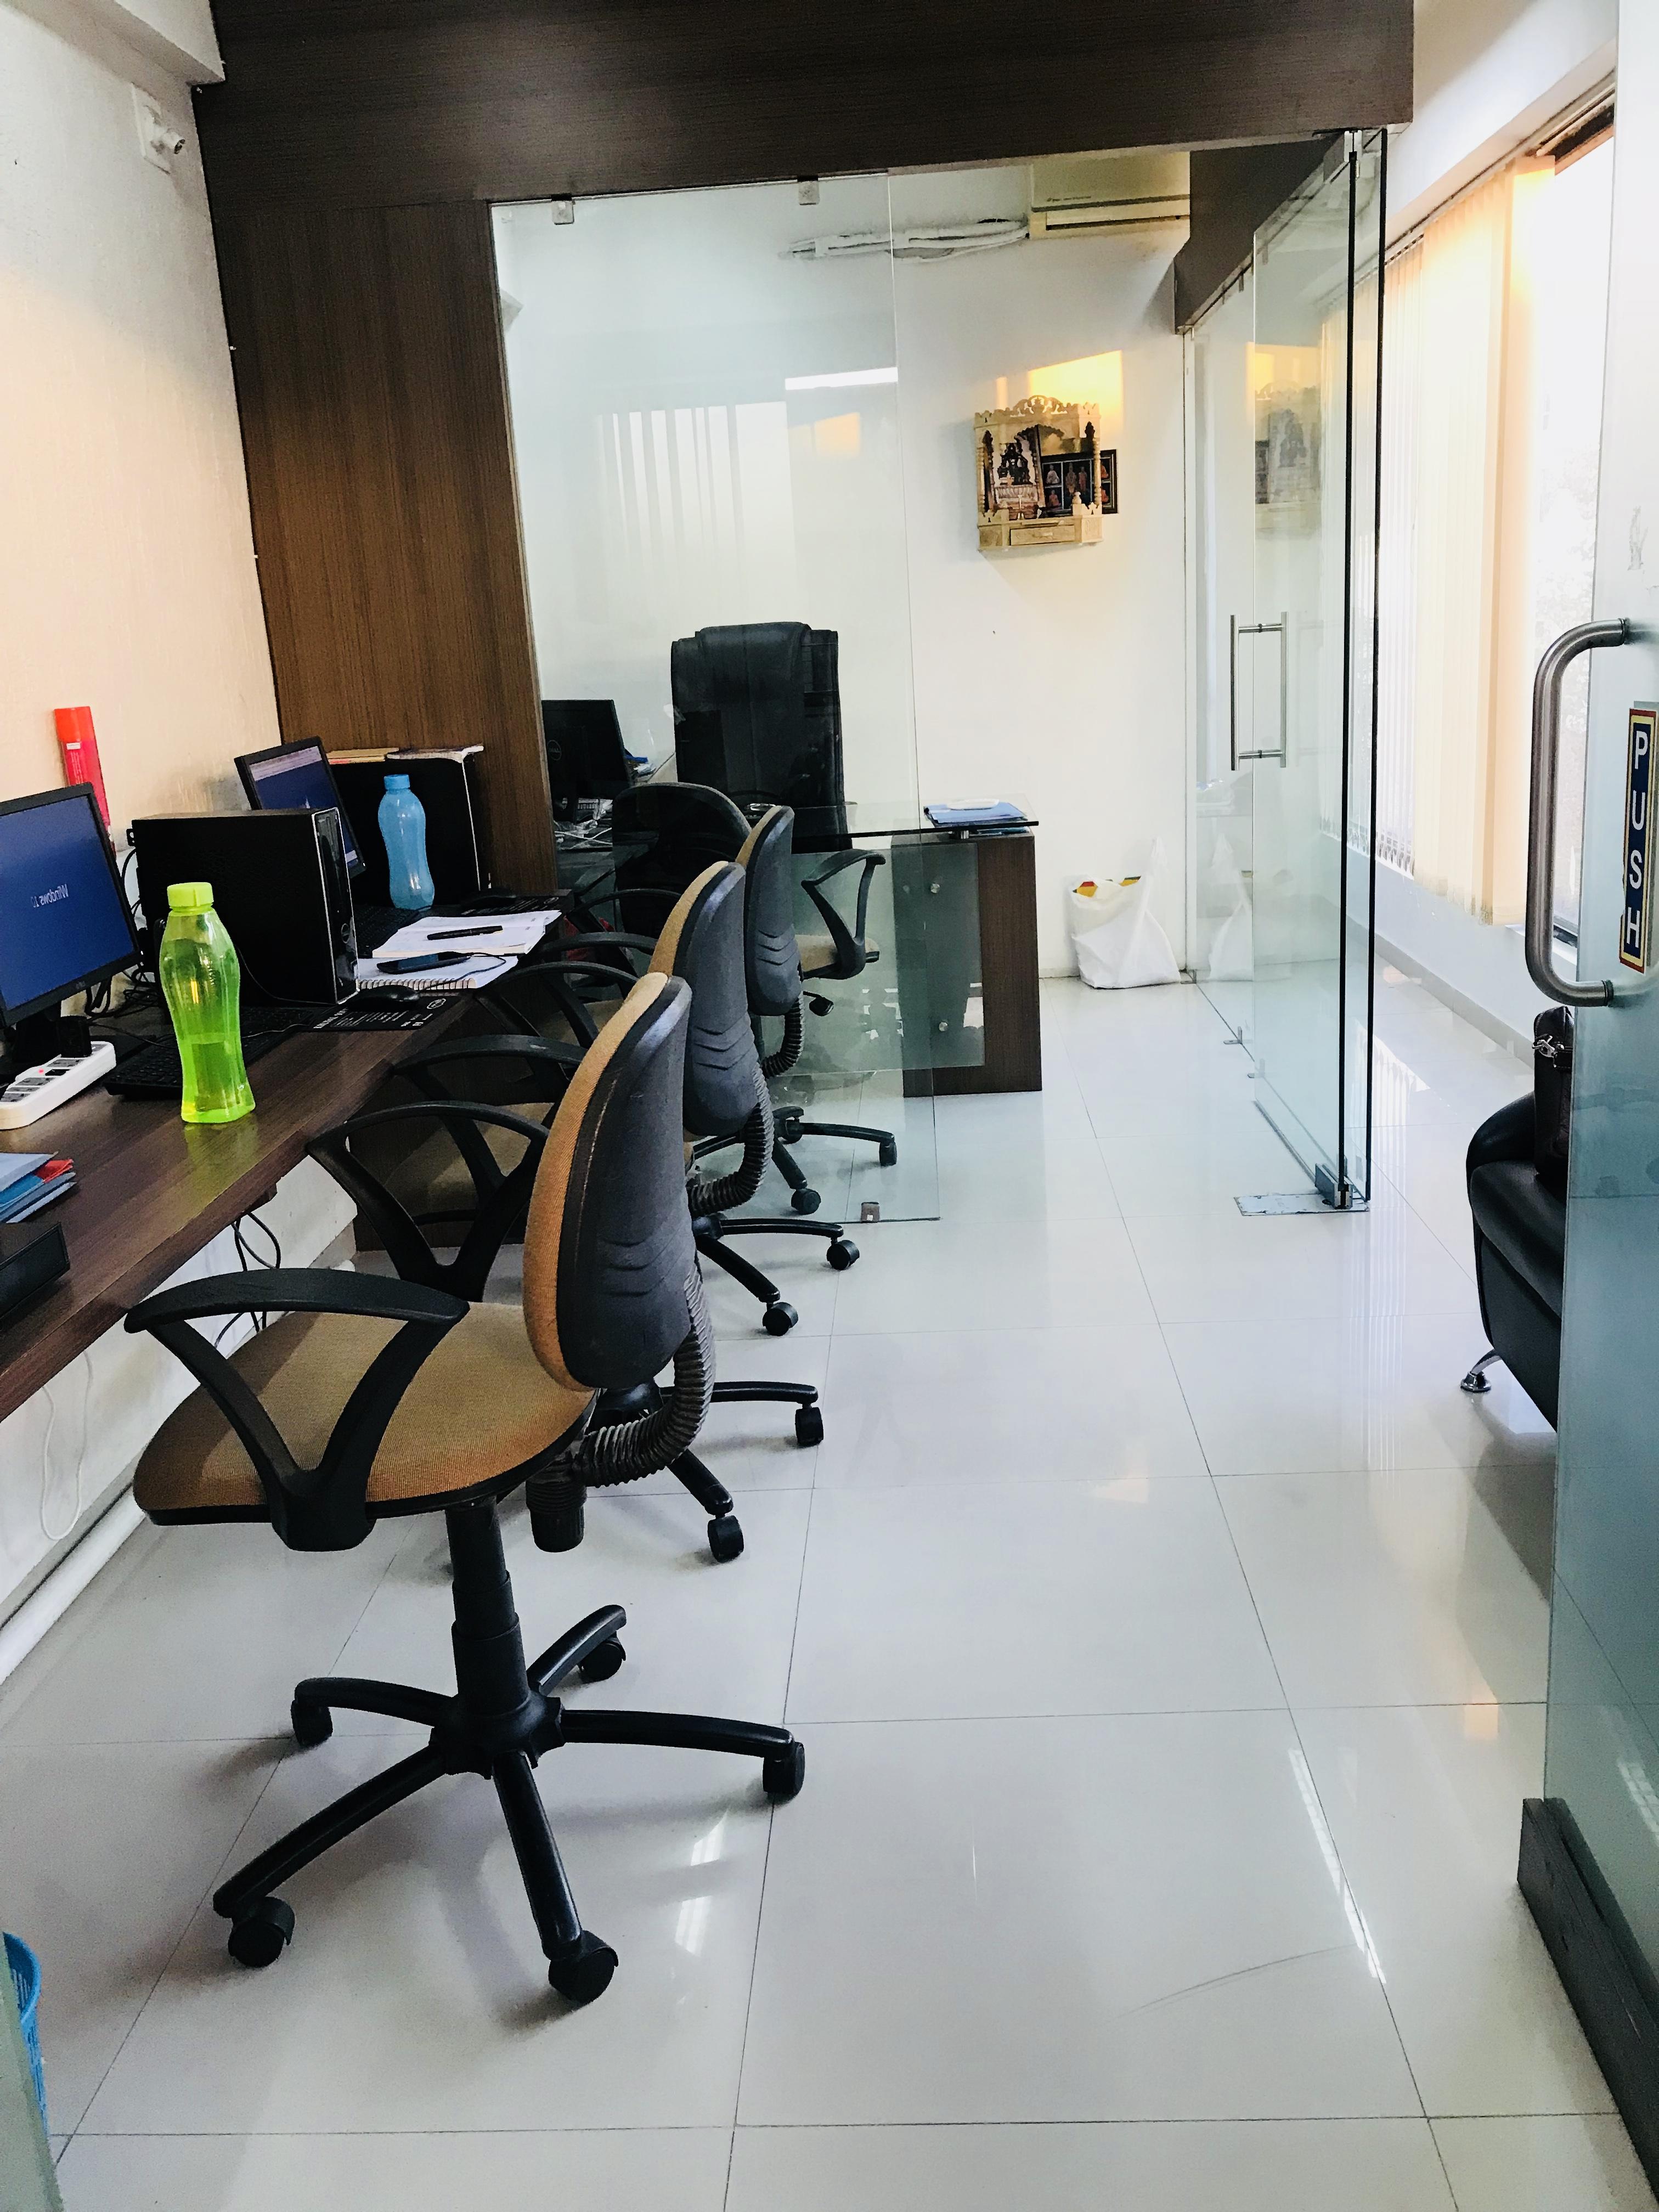 HSVJ & Co  in Ambawadi, Ahmedabad-380015 | Sulekha Ahmedabad